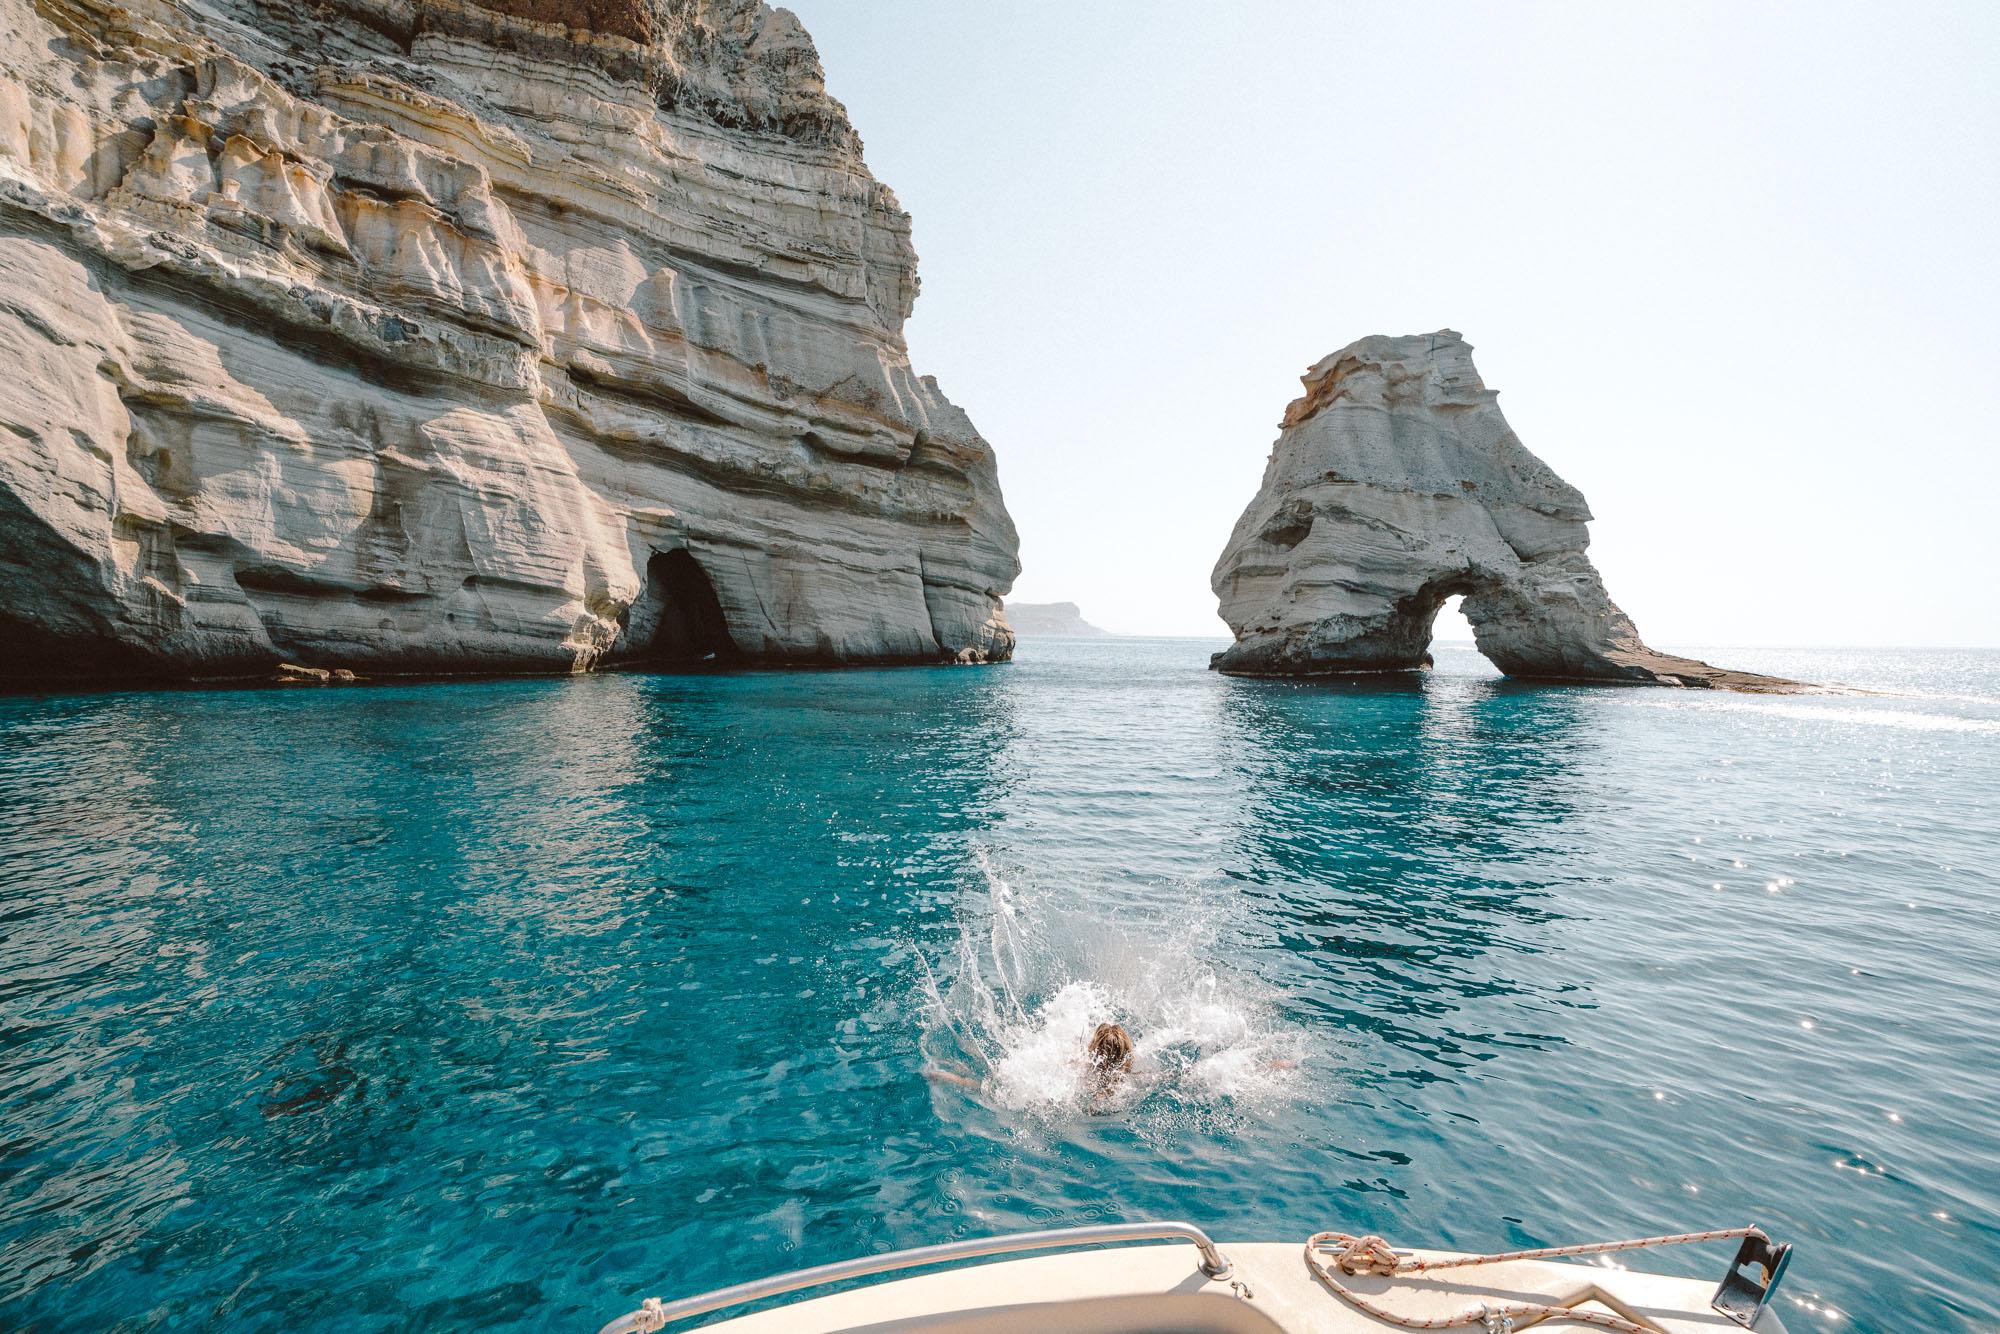 Kleftiko Caves, Milos Greece Travel Guide via Find Us Lost